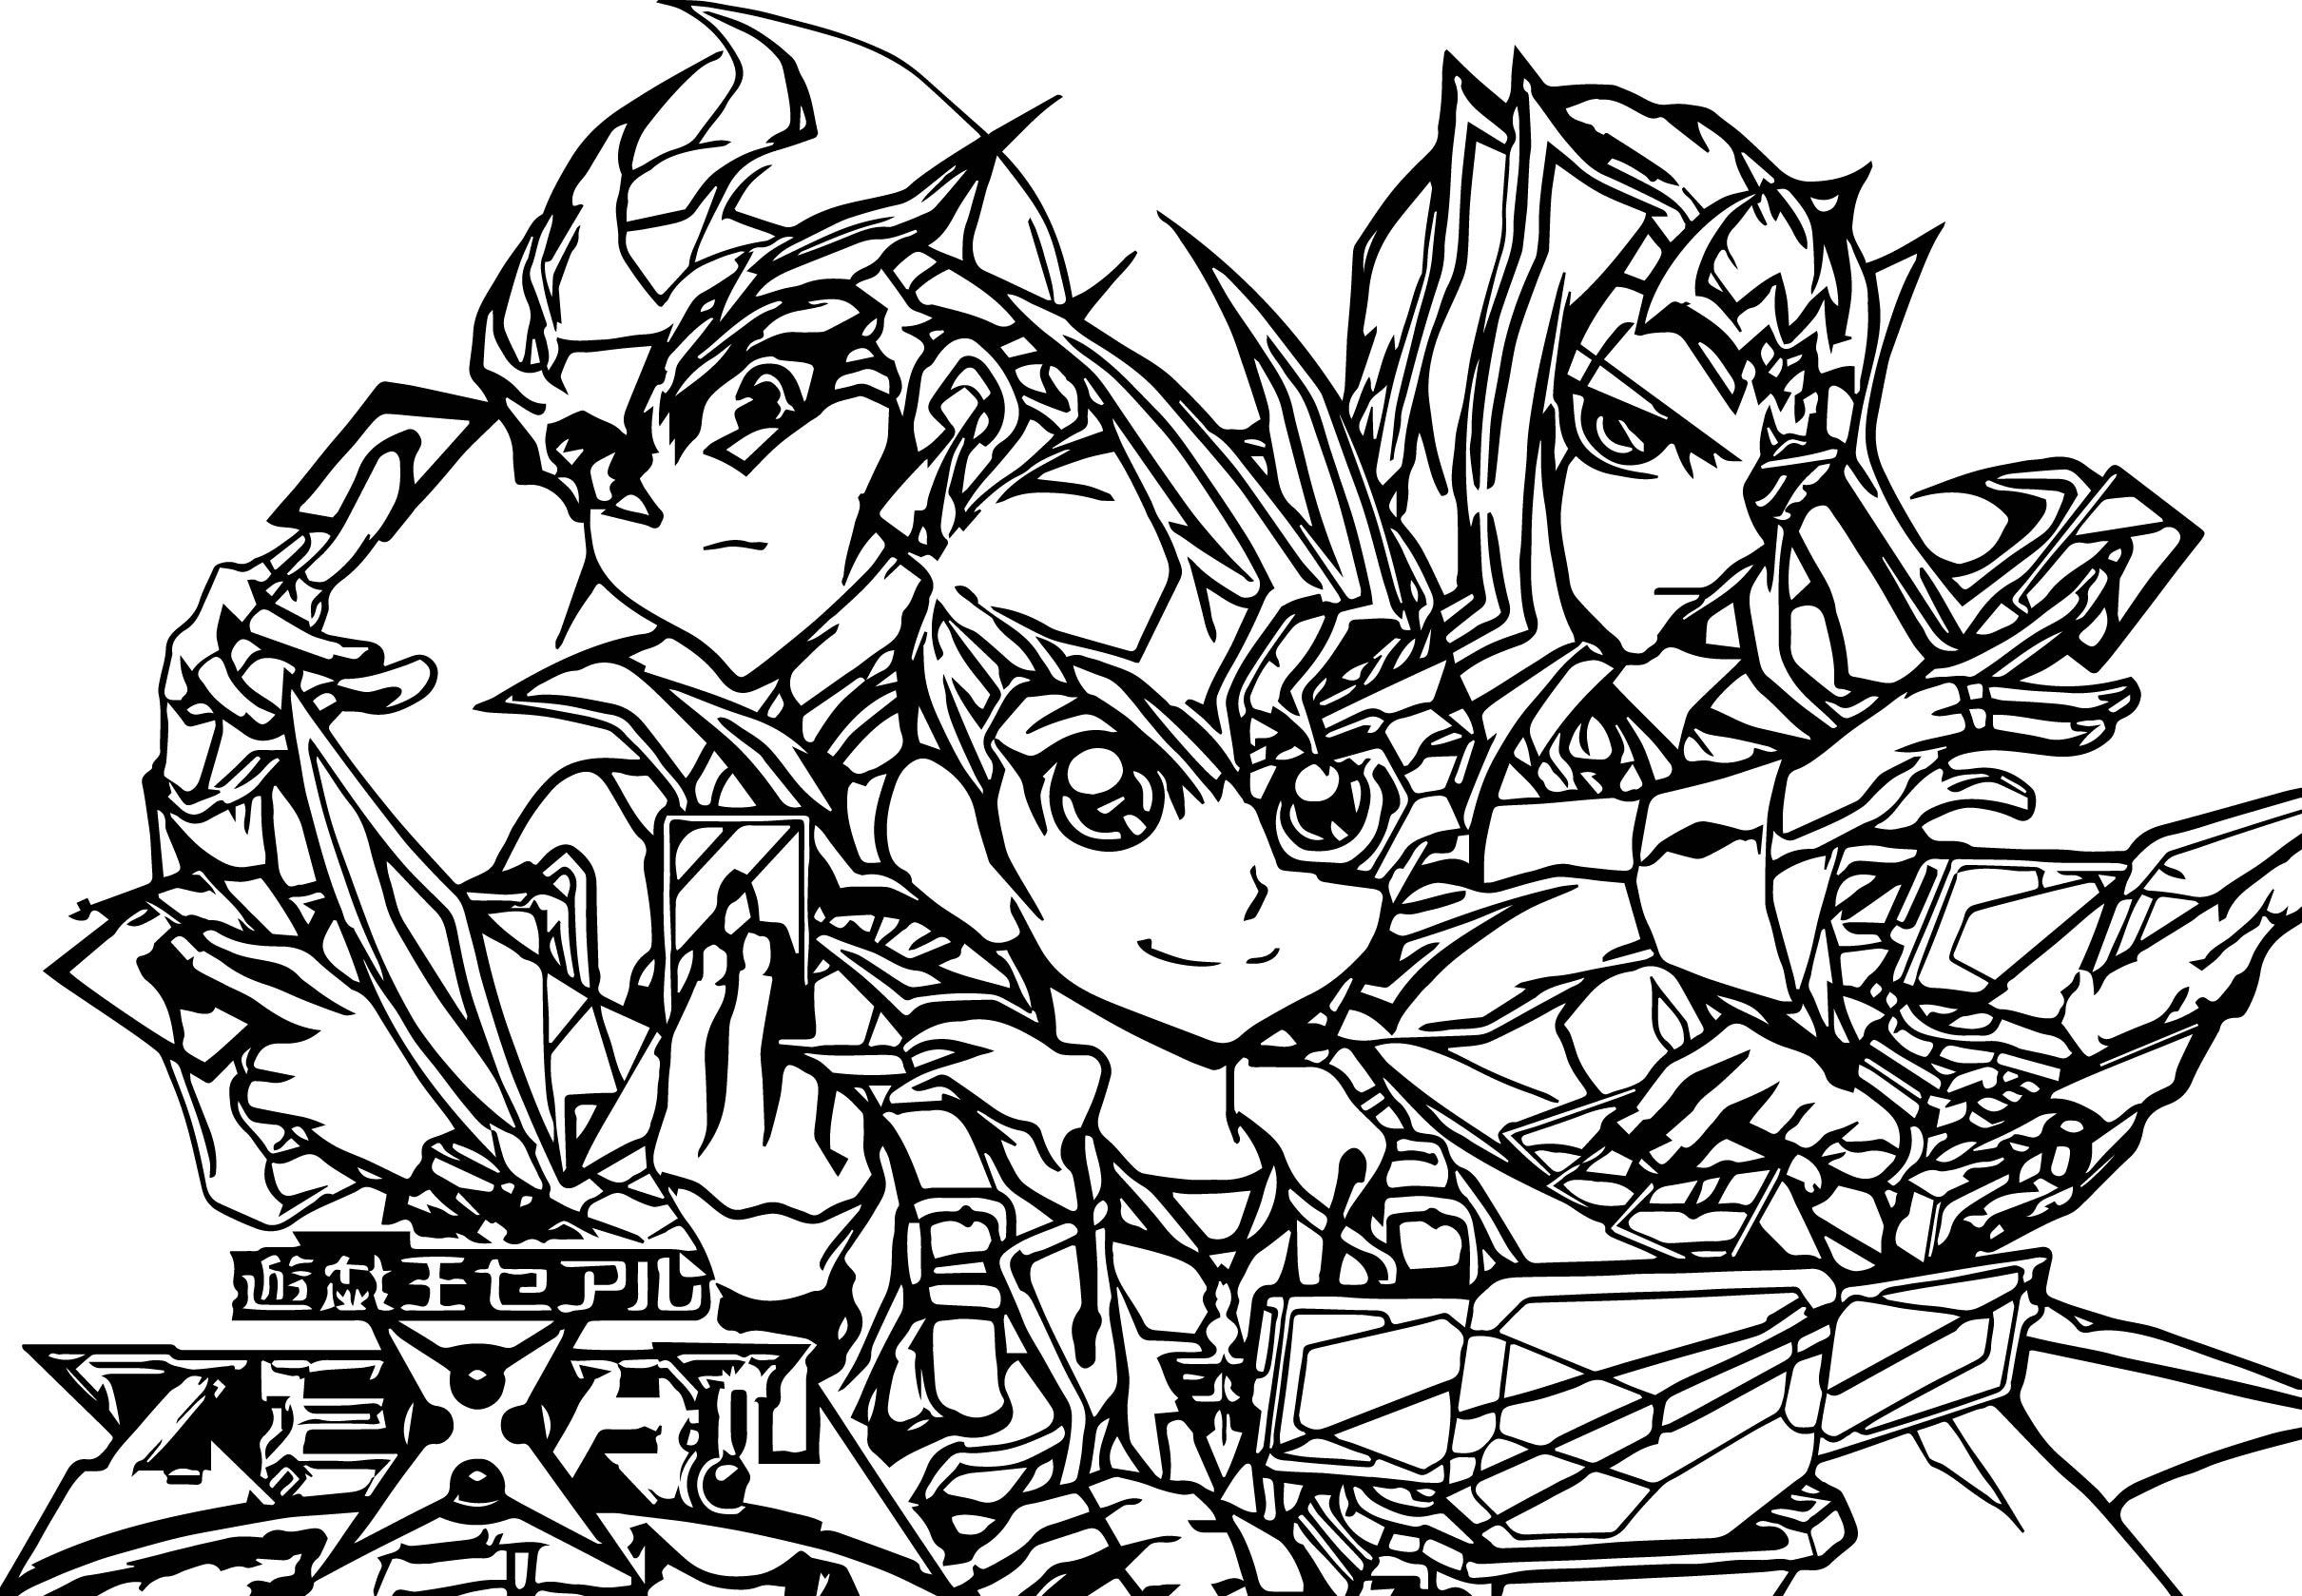 Yu Gi Oh Card War Coloring Page